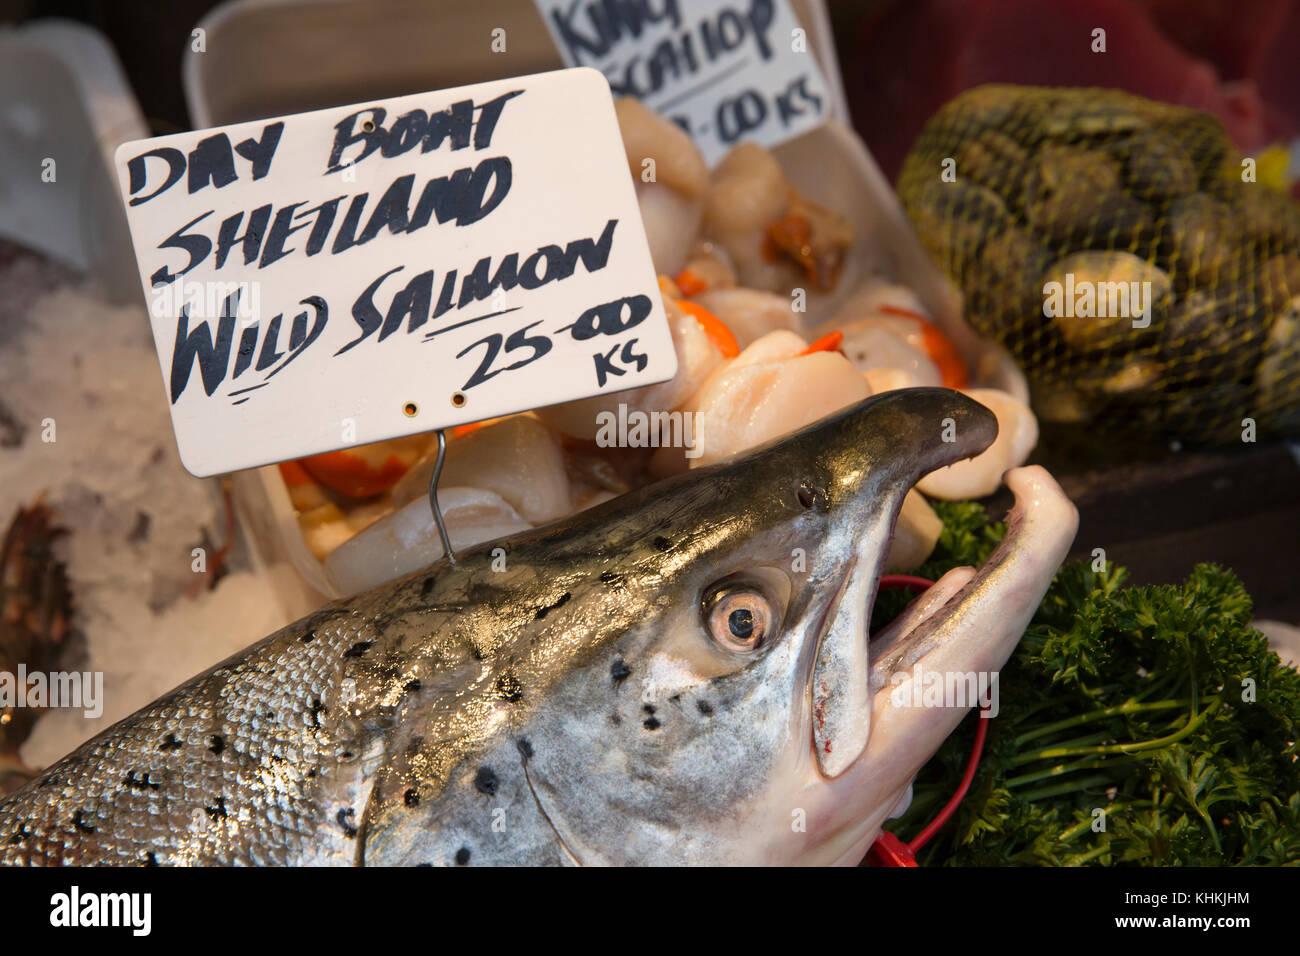 UK, London, Southwark, Borough Market, fish stall, day boat Shetland wild Salmon for sale Stock Photo